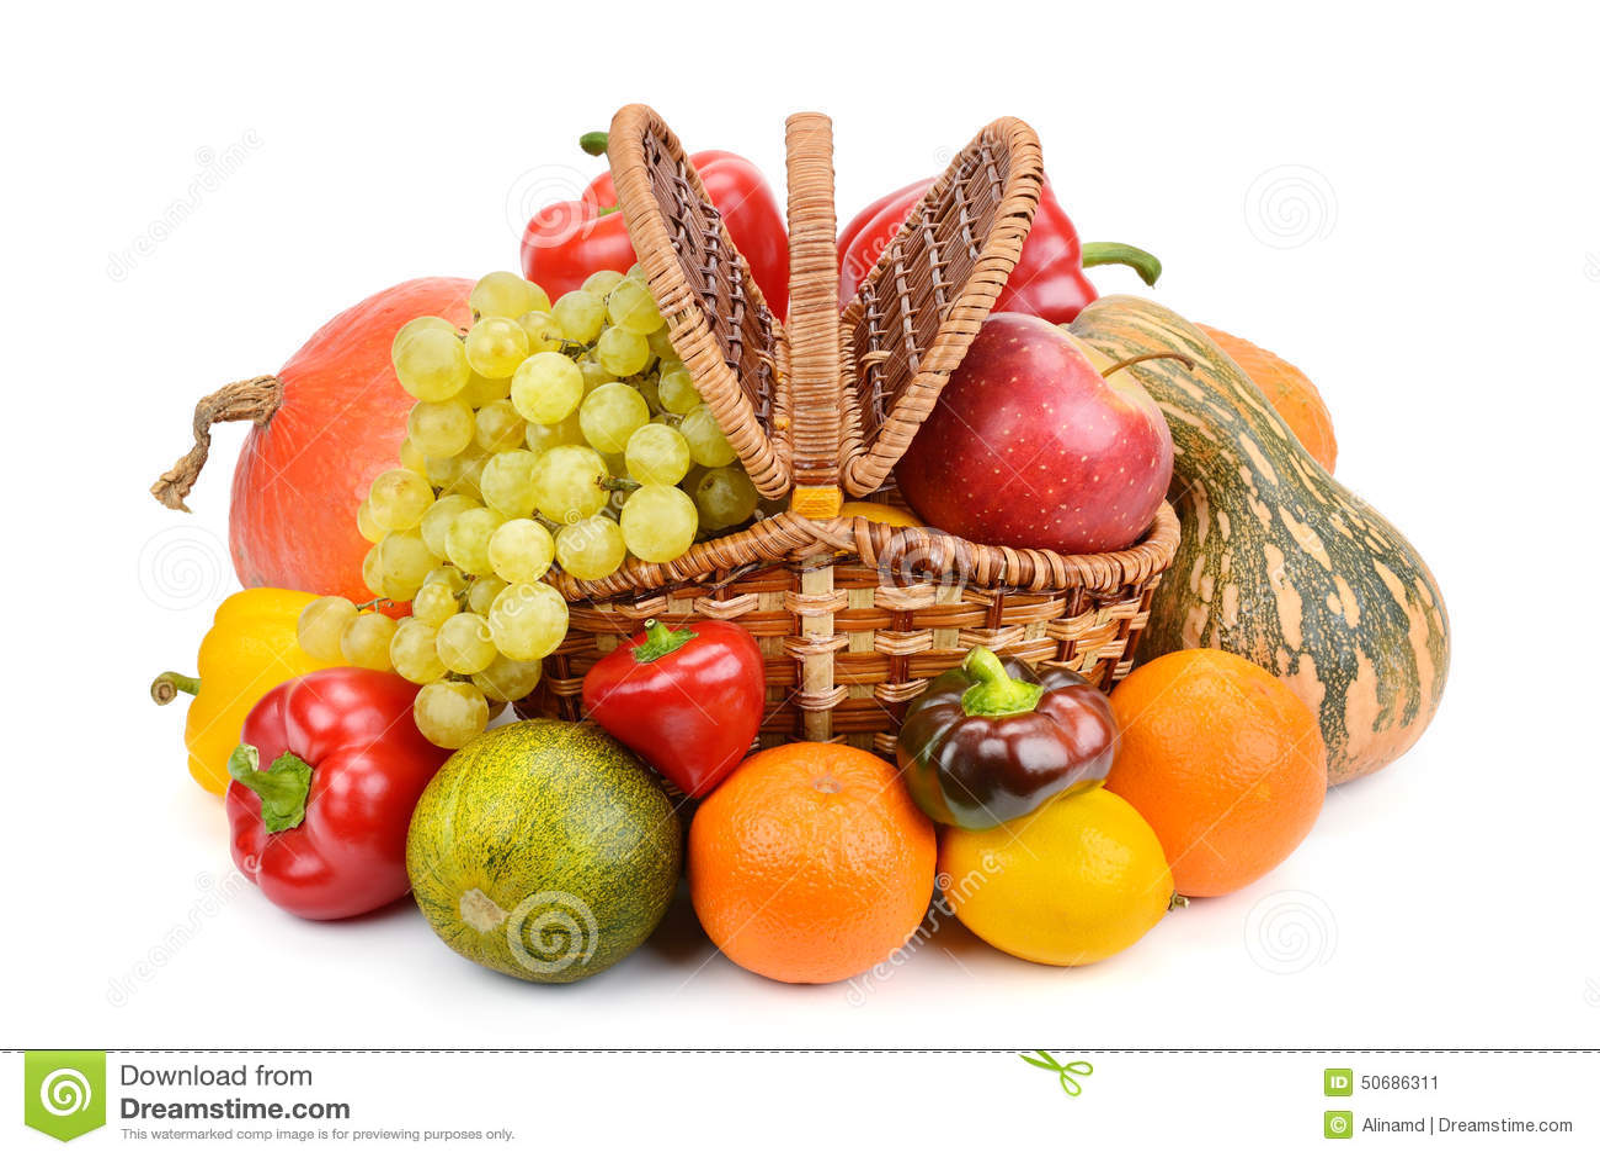 Download 篮子果菜类 库存图片. 图片 包括有 有机, 自然, bakeshop, 营养素, 橙色, 柑橘, 生活 - 50686311